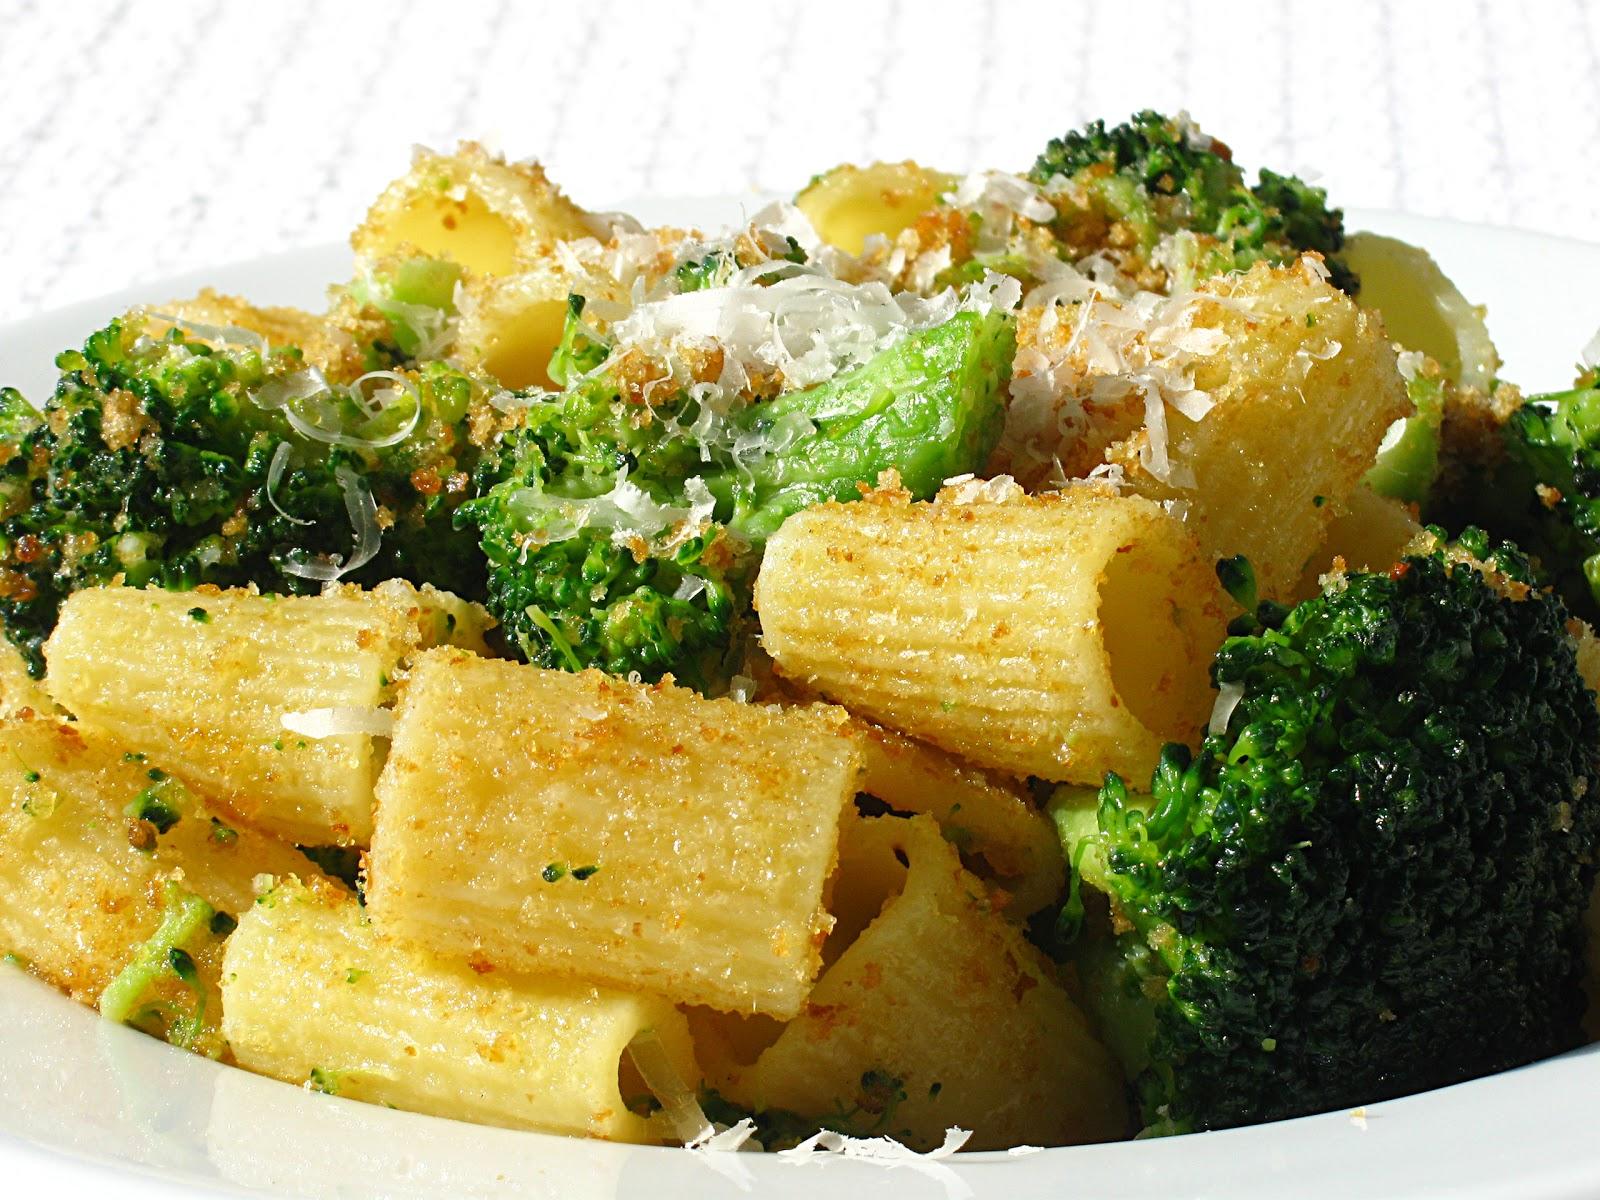 All That Splatters: Rigatoni with Broccoli, Garlic & Breadcrumbs